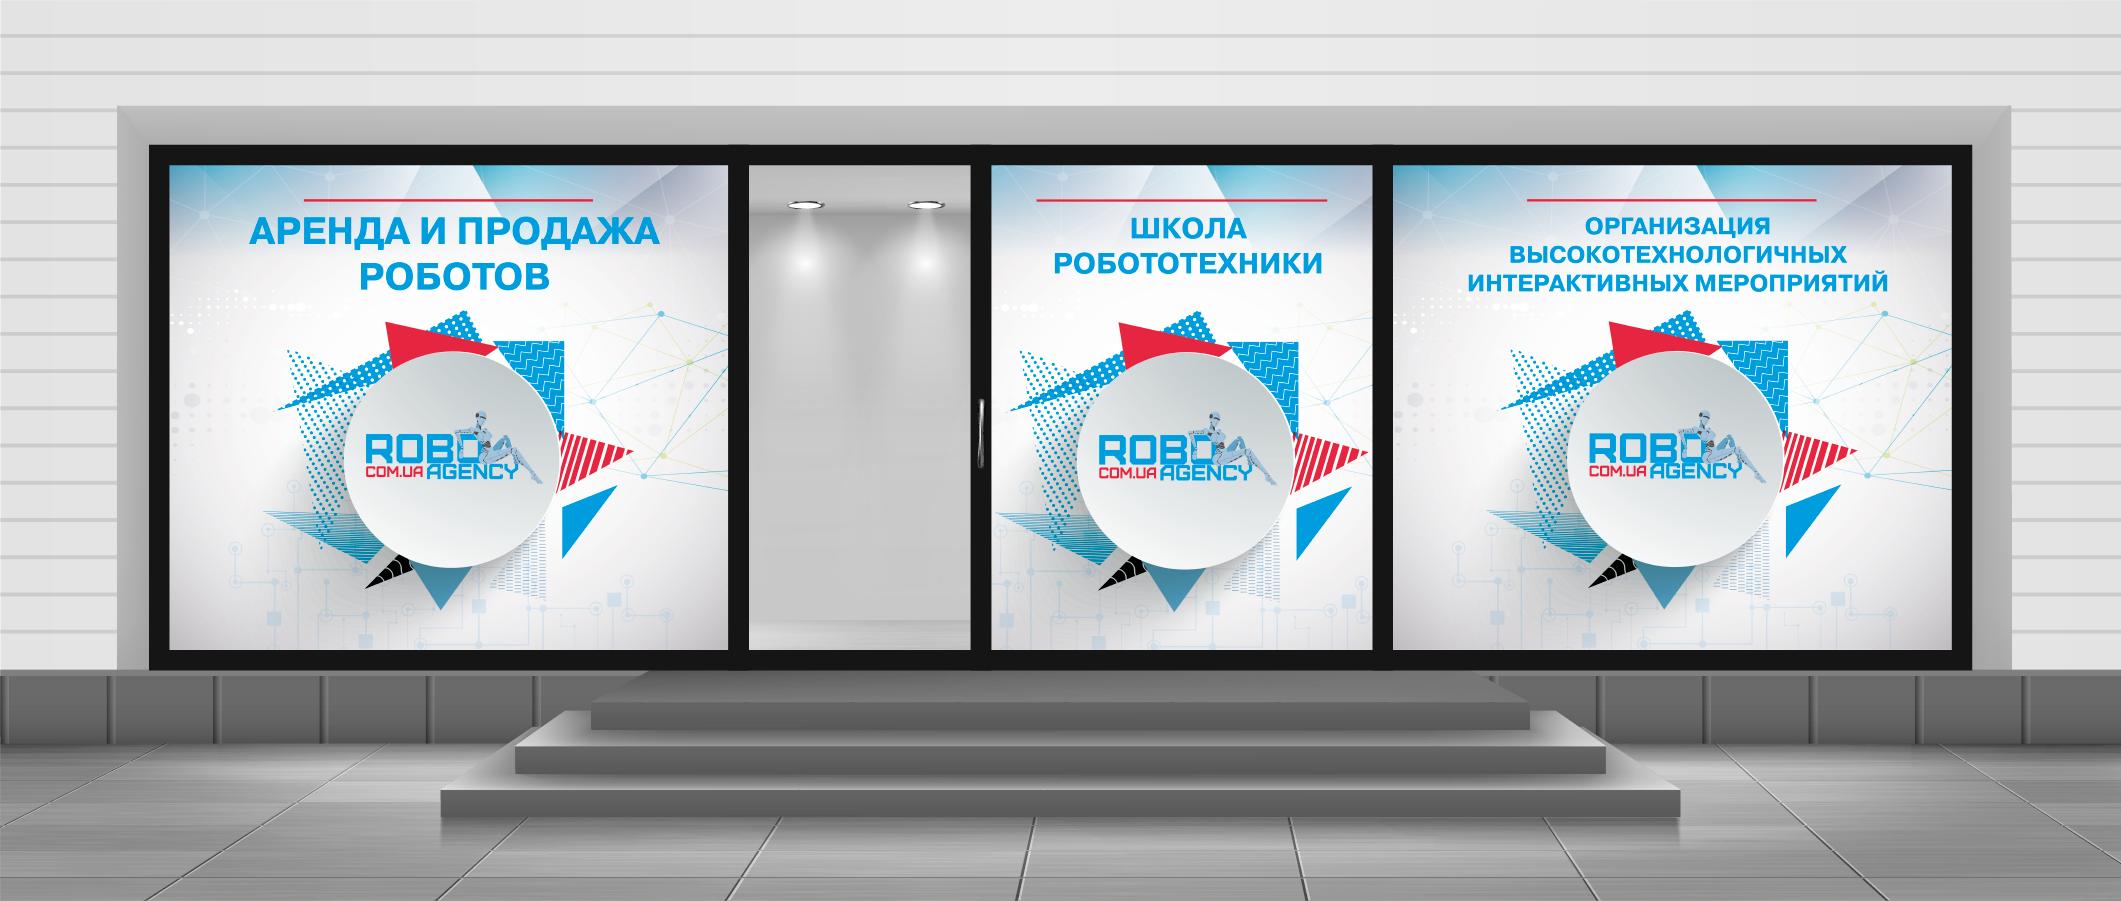 Robo Agency дизайн логотипа Киев